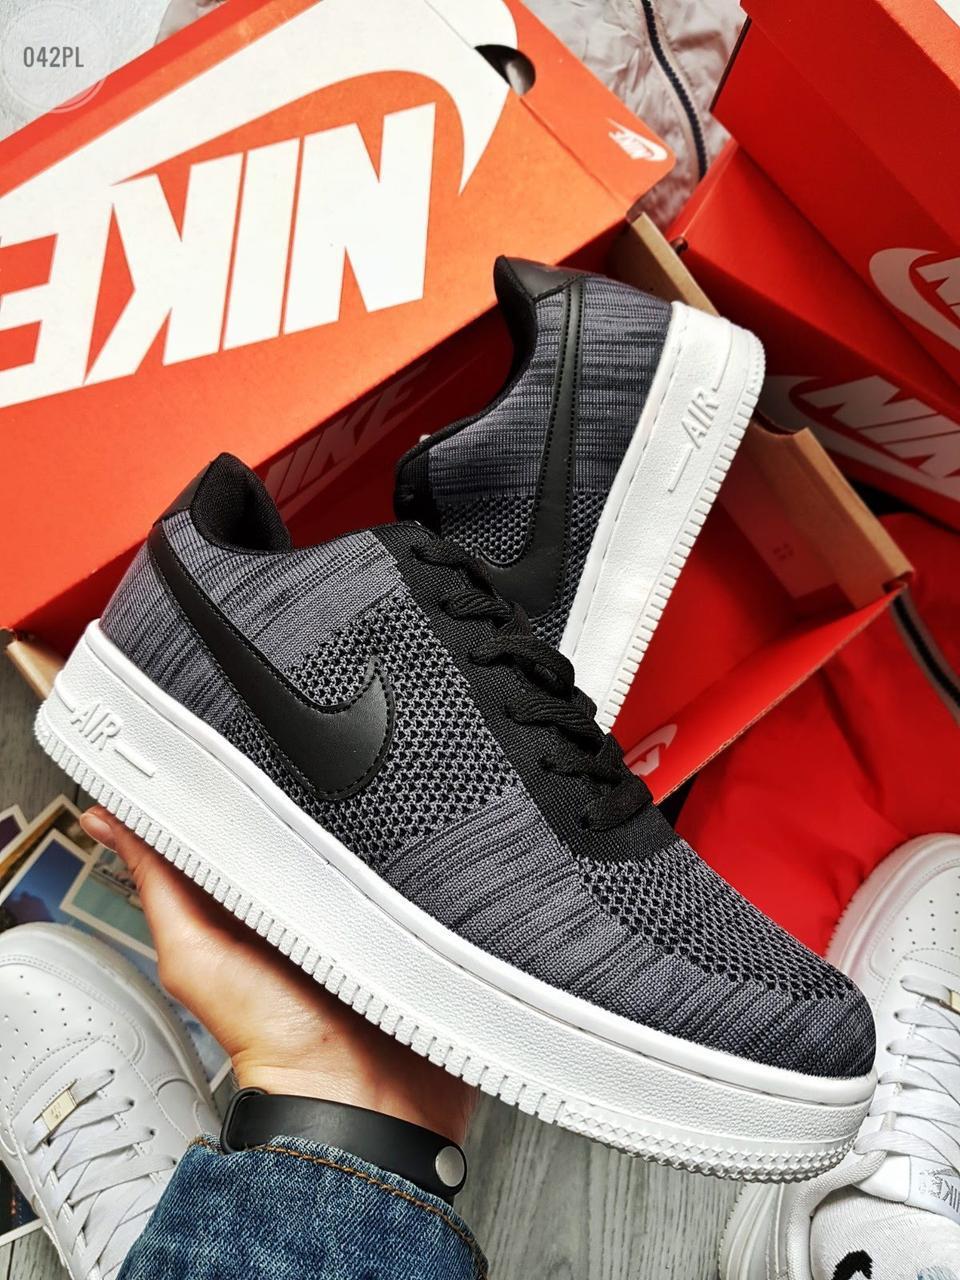 Мужские кроссовки Nike Air Force Flyknit Low Dark Grey (р. 42, 42.5, 43) Серые